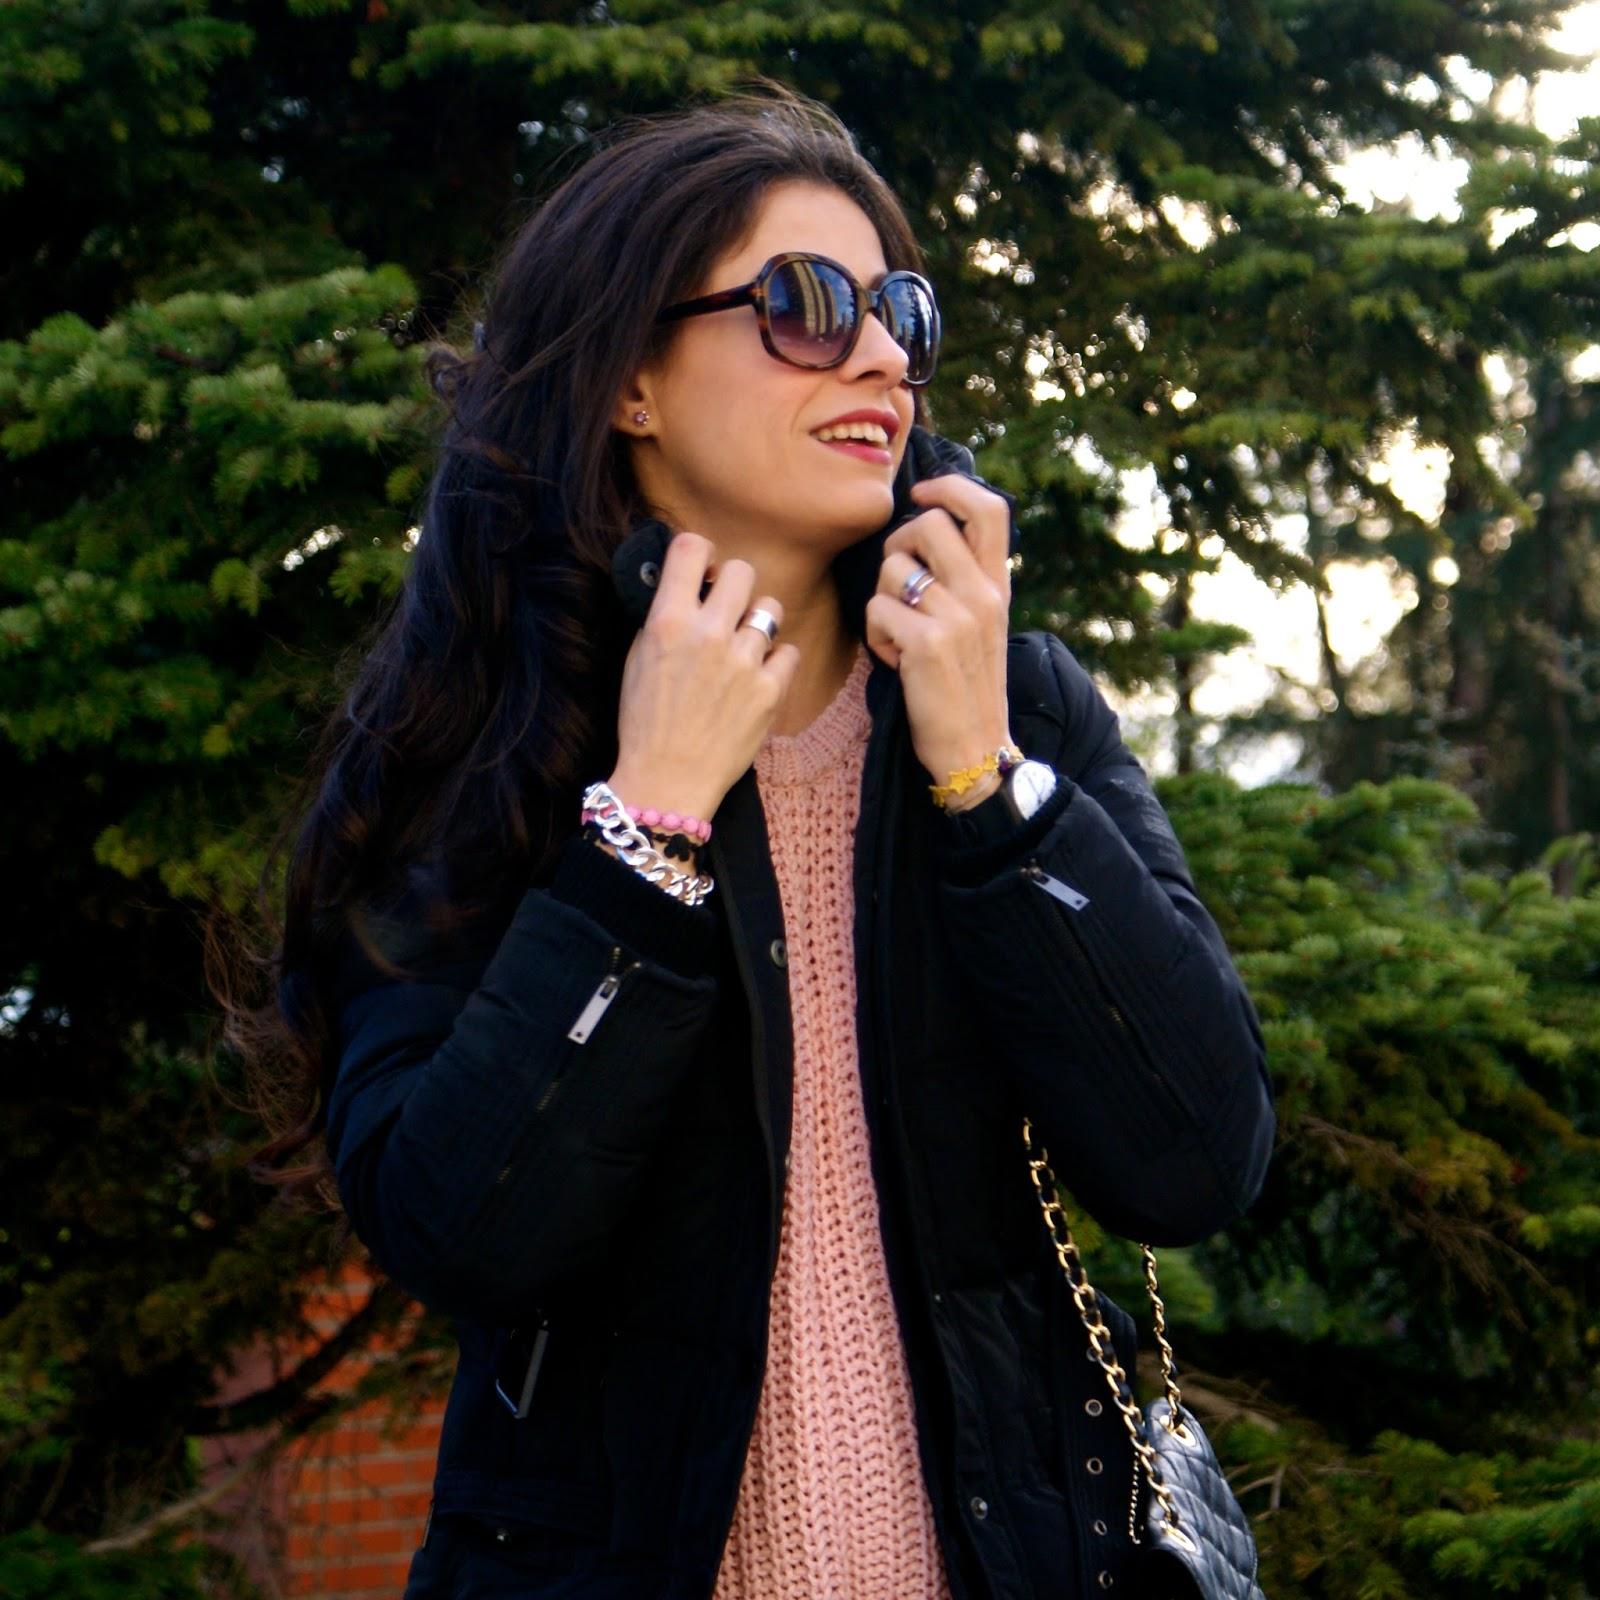 La caprichossa mi diario runner blog de moda belleza - Lavadora fondo reducido ...